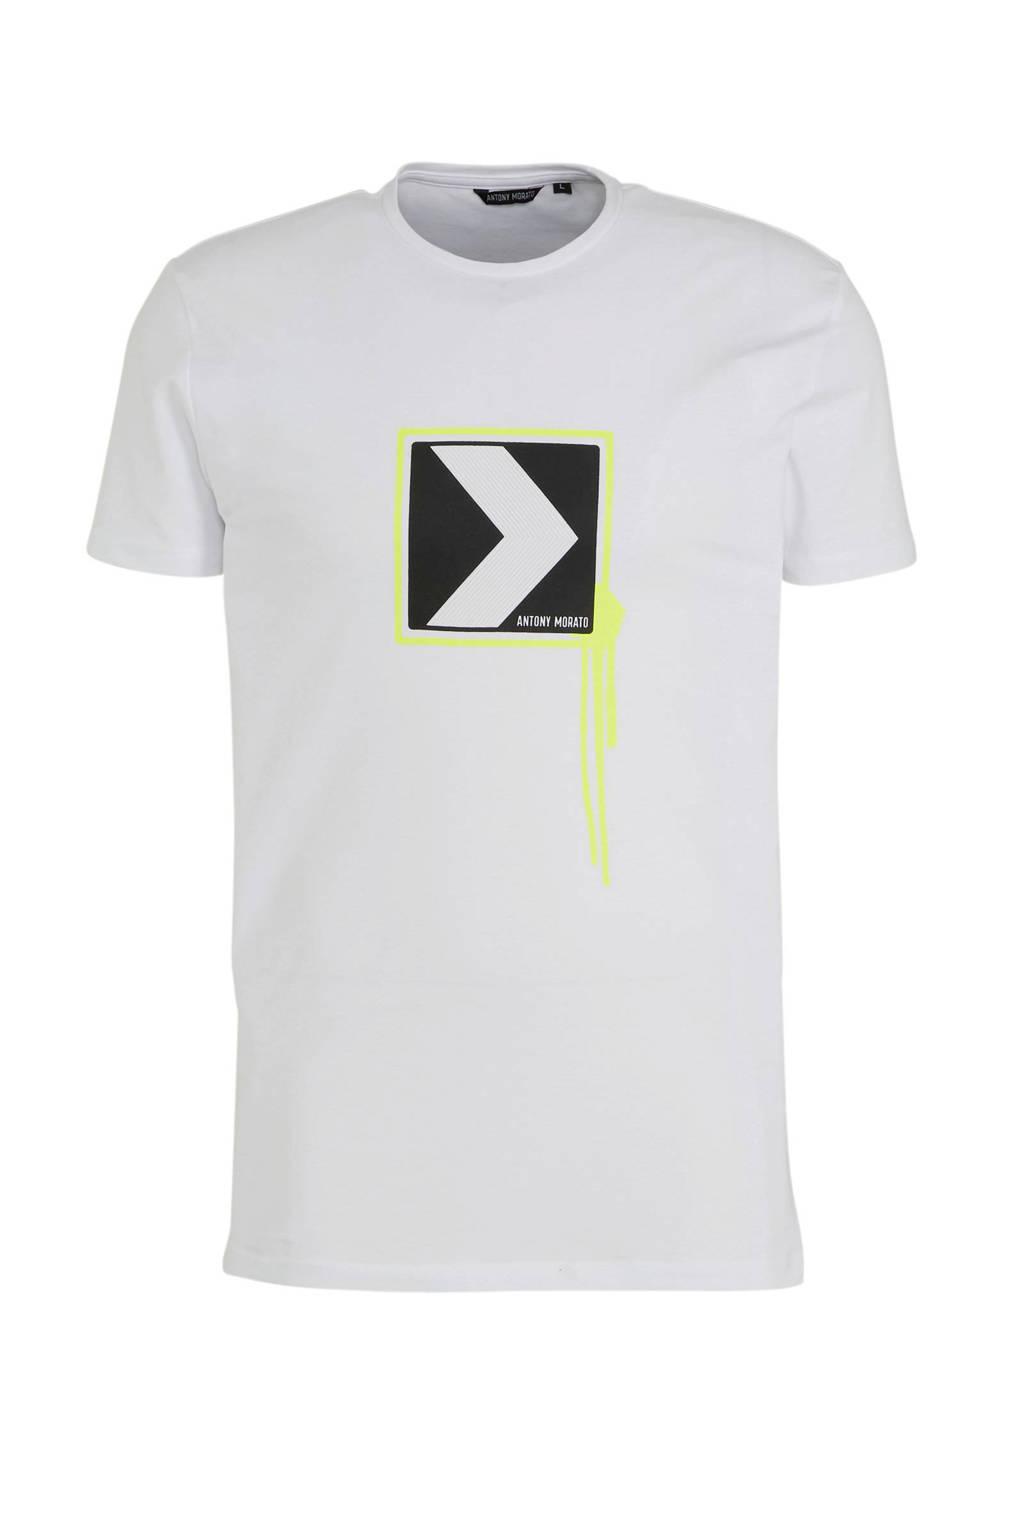 Antony Morato T-shirt met printopdruk wit, Wit